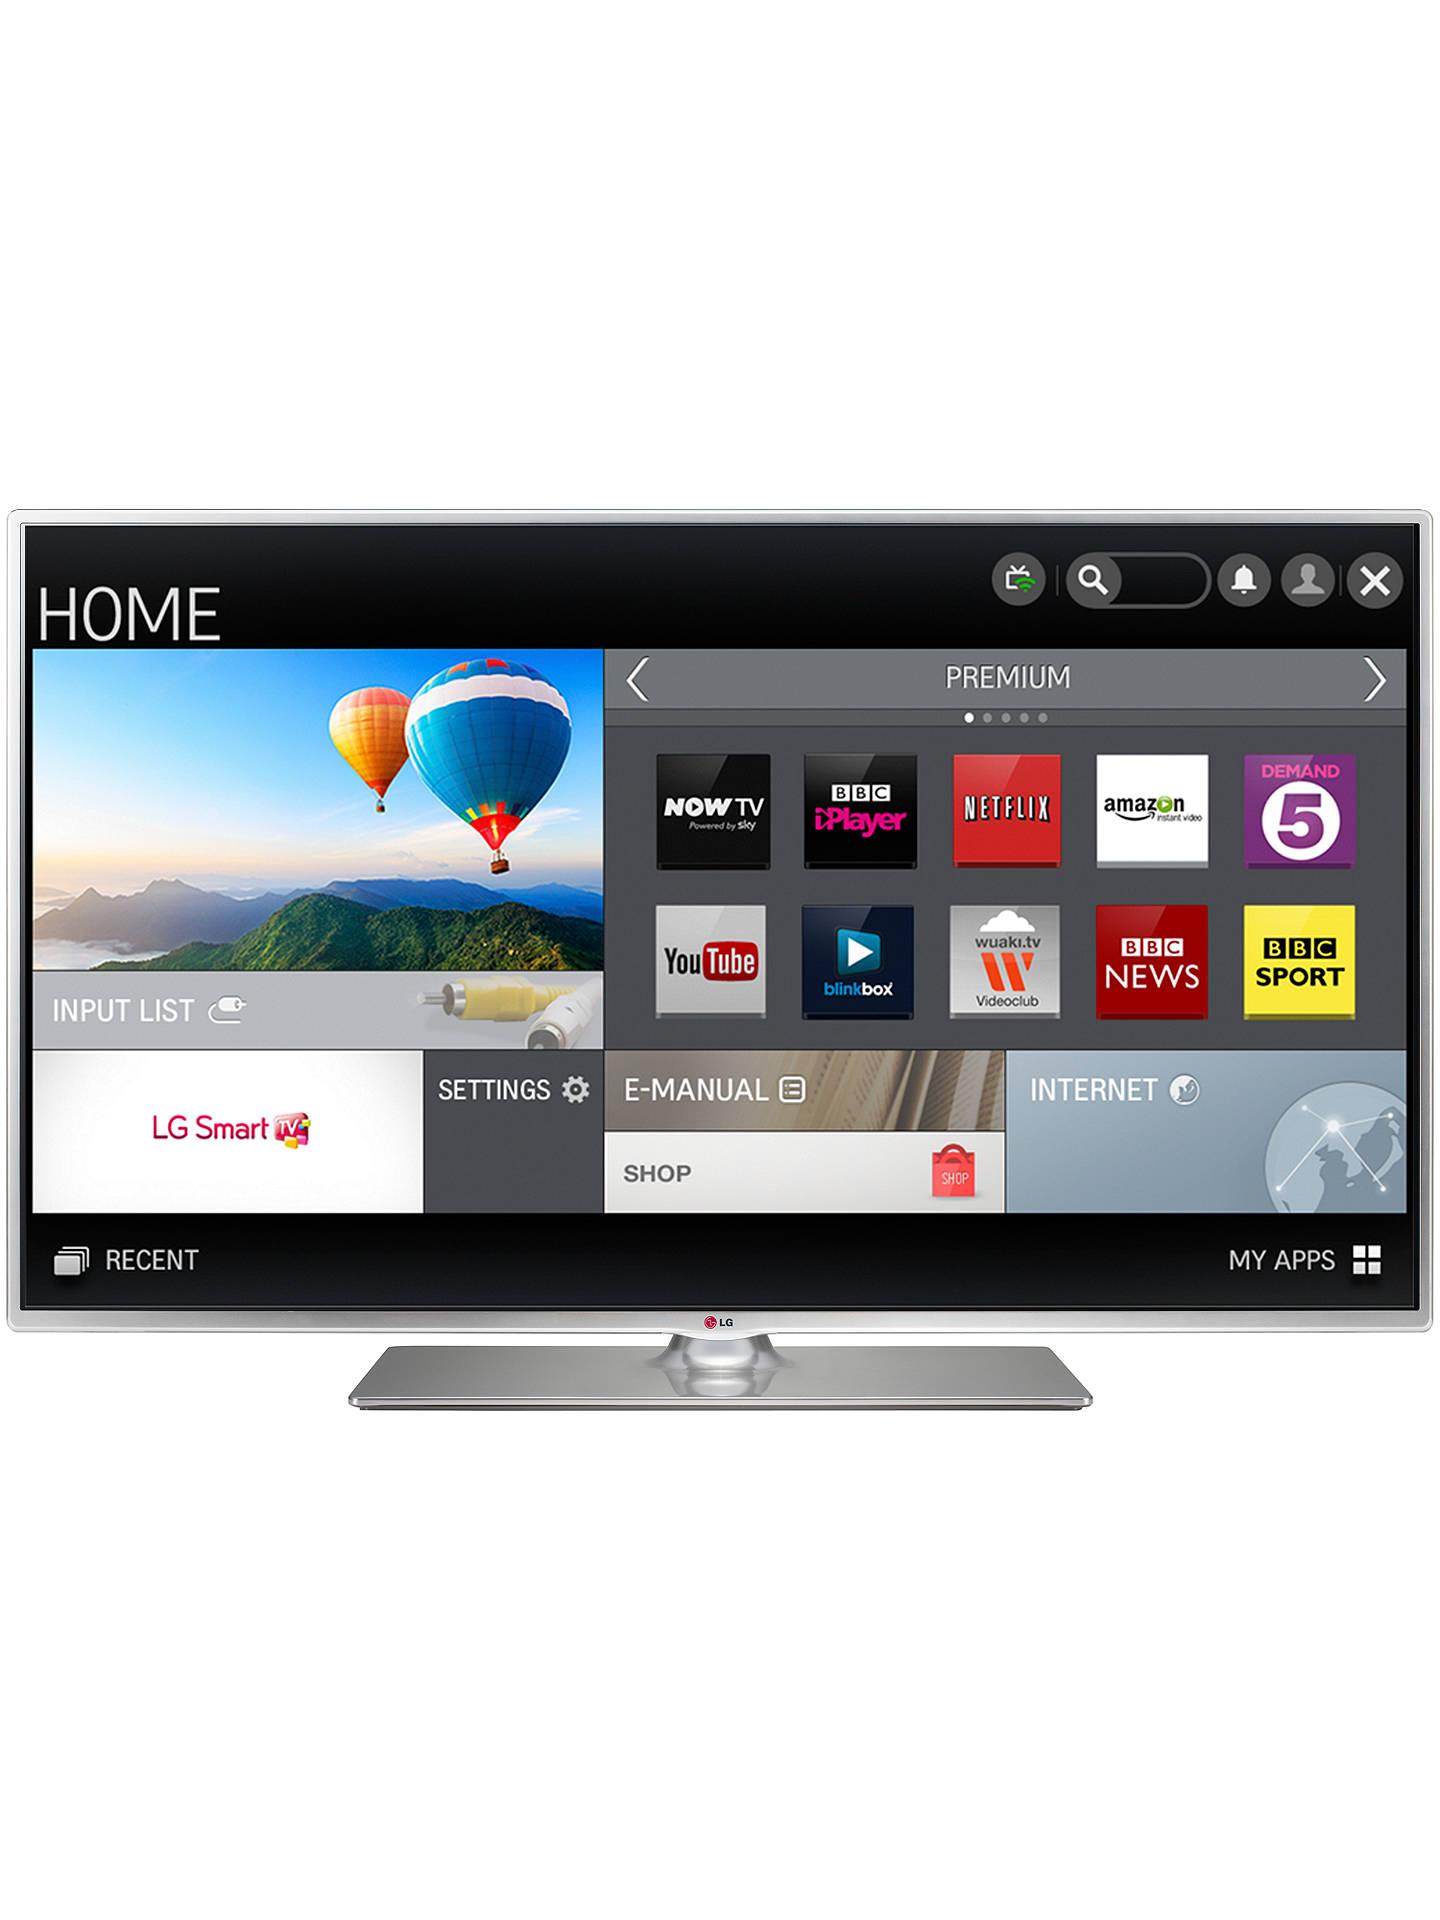 LG Smart TV | UHD 4K 43 inch TV | LG Australia